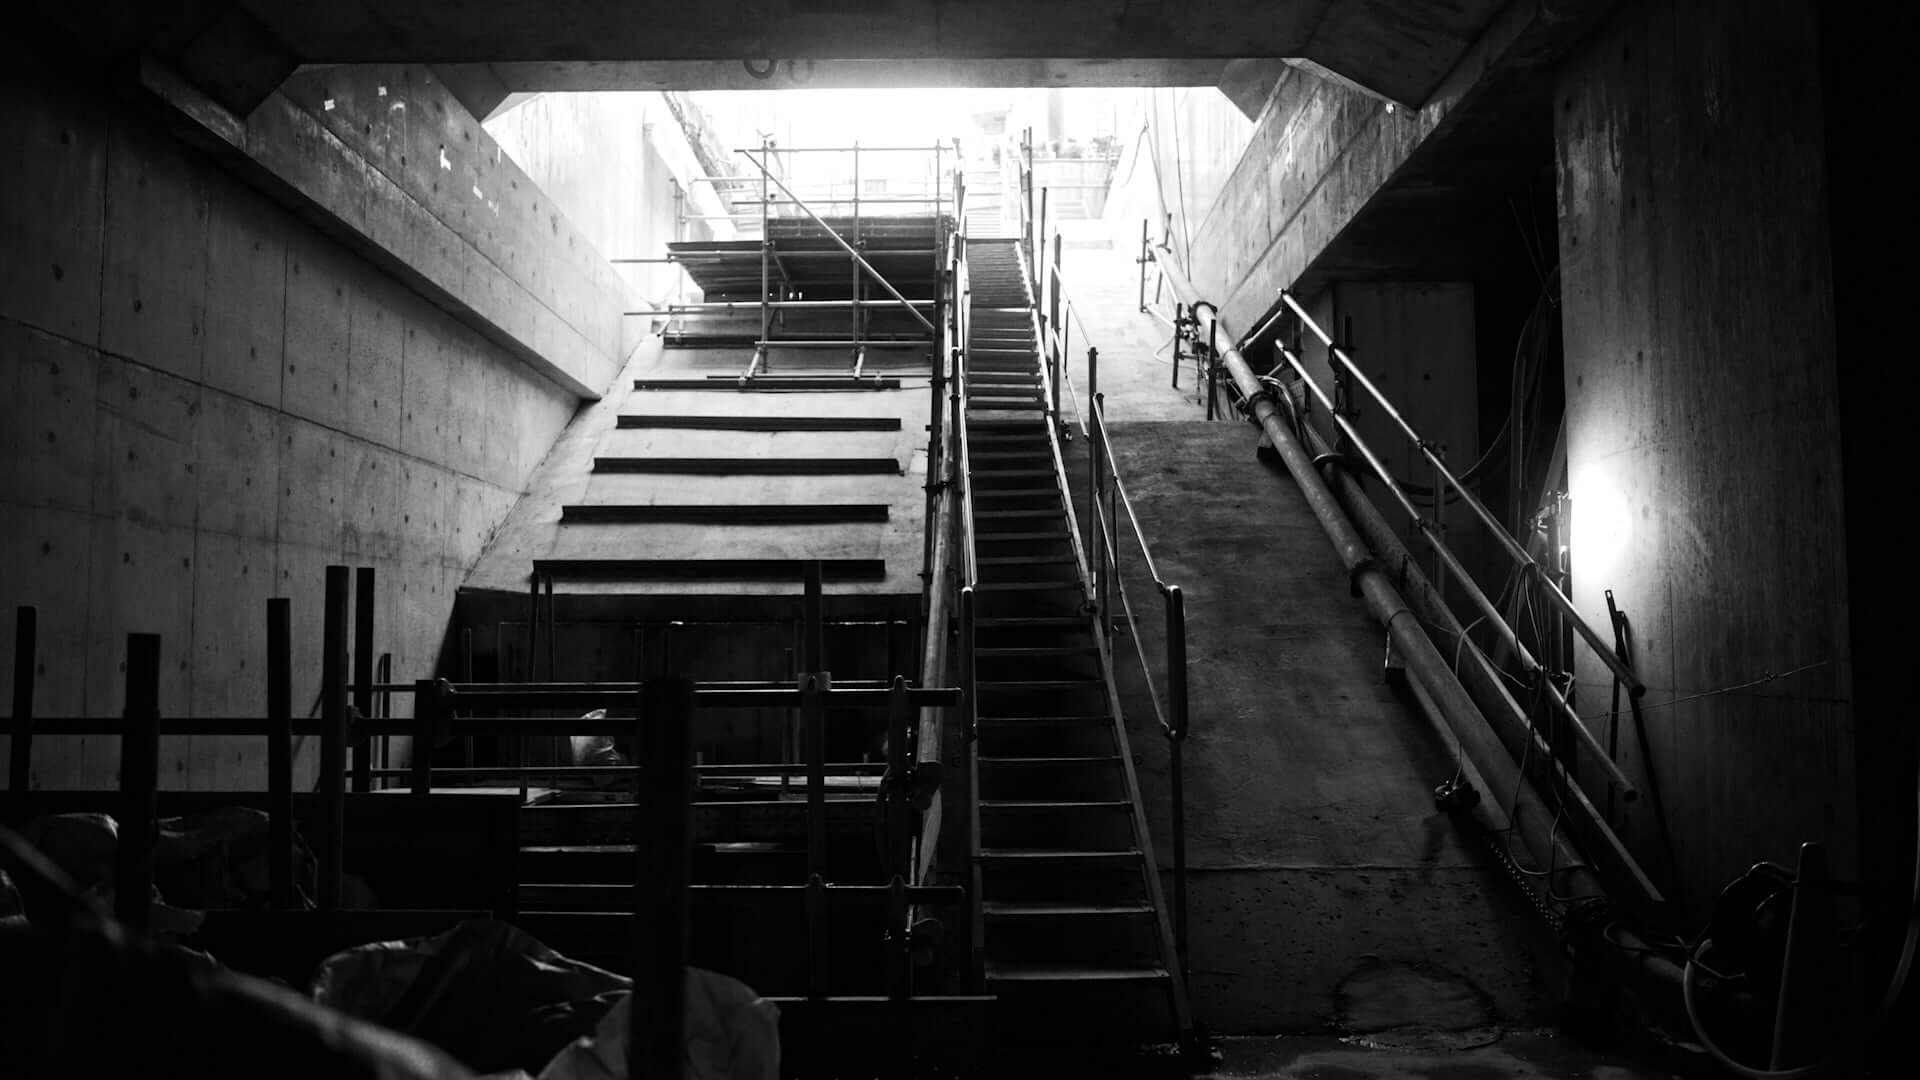 Seiho、映像作家・山田智和6年ぶりのオリジナル作品に参加|10台のマルチモニターを使ったアート展示 artculture190801seiho_5-1920x1080